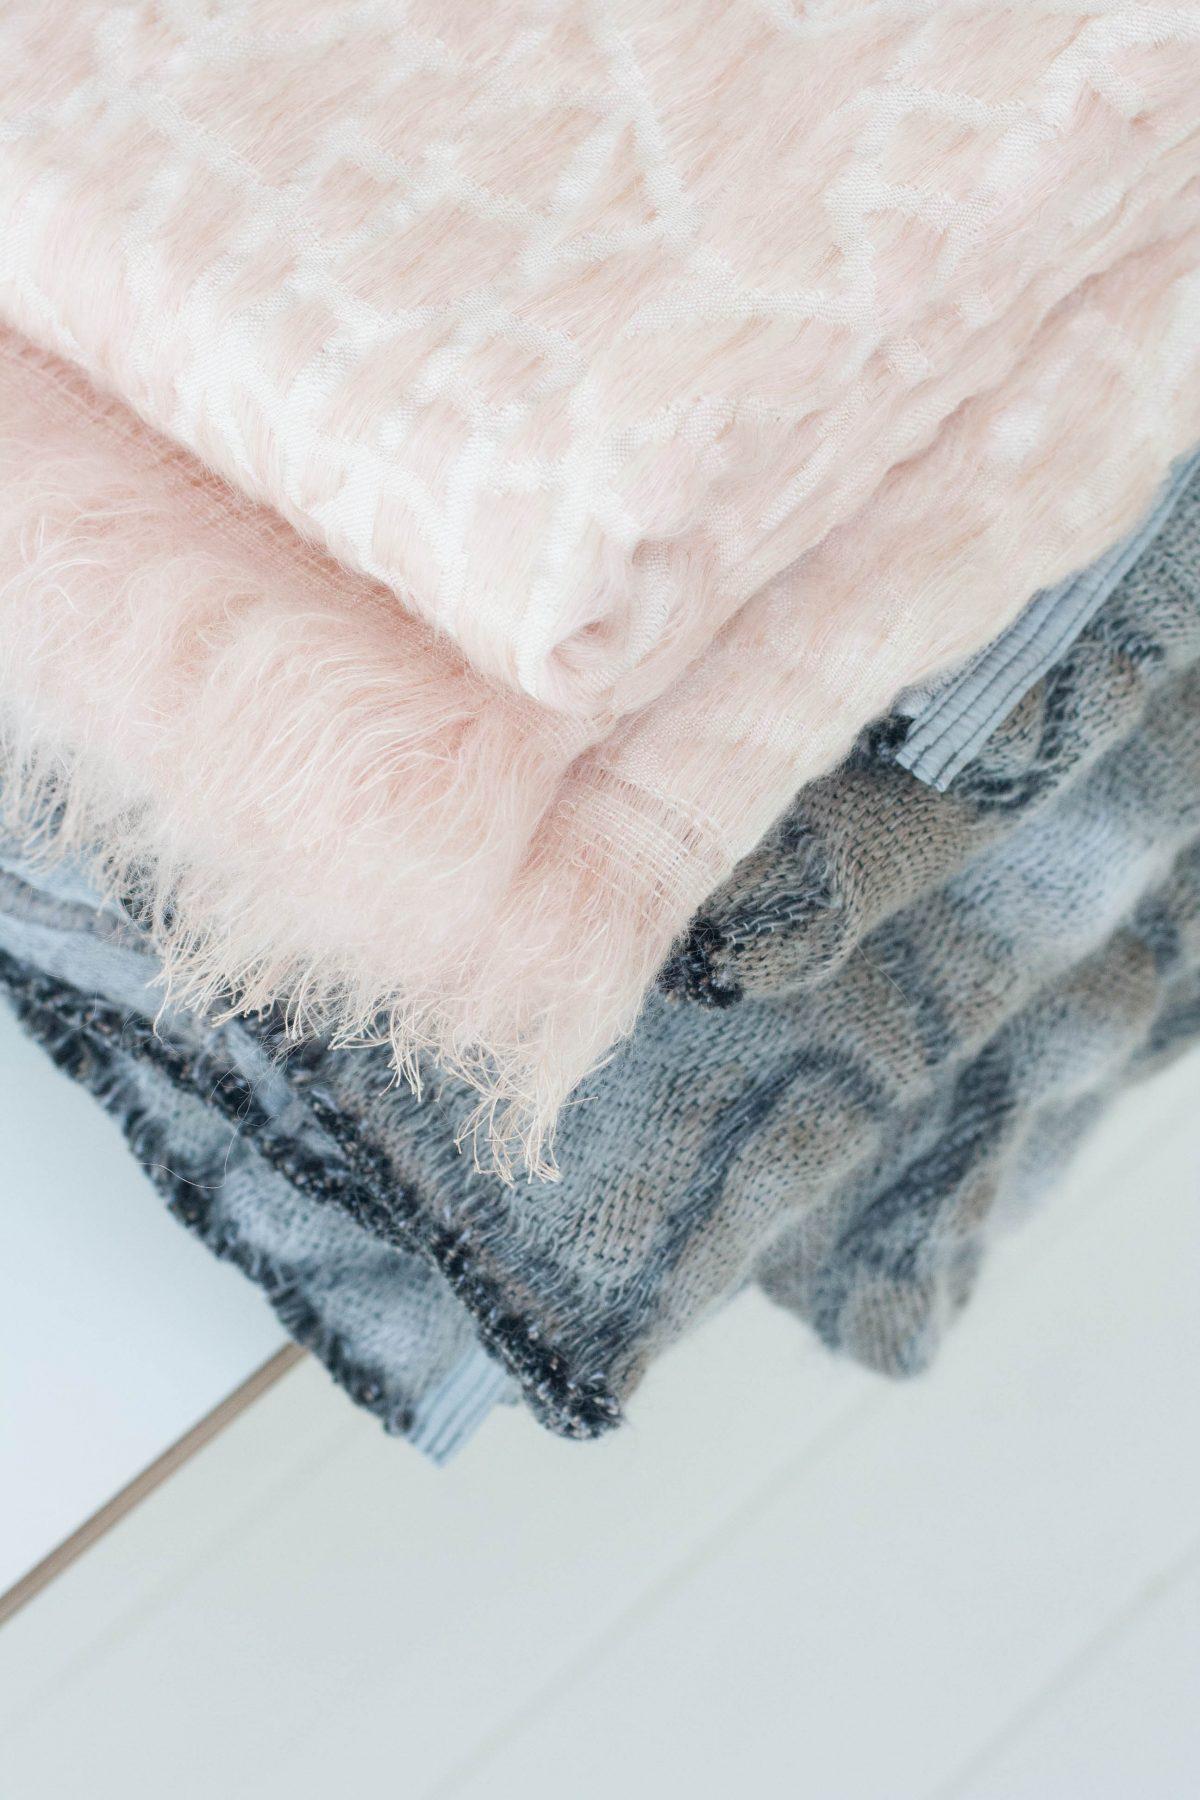 Hide dekens roze en grijs Nienke Hoogvliet-foto Holy Marder